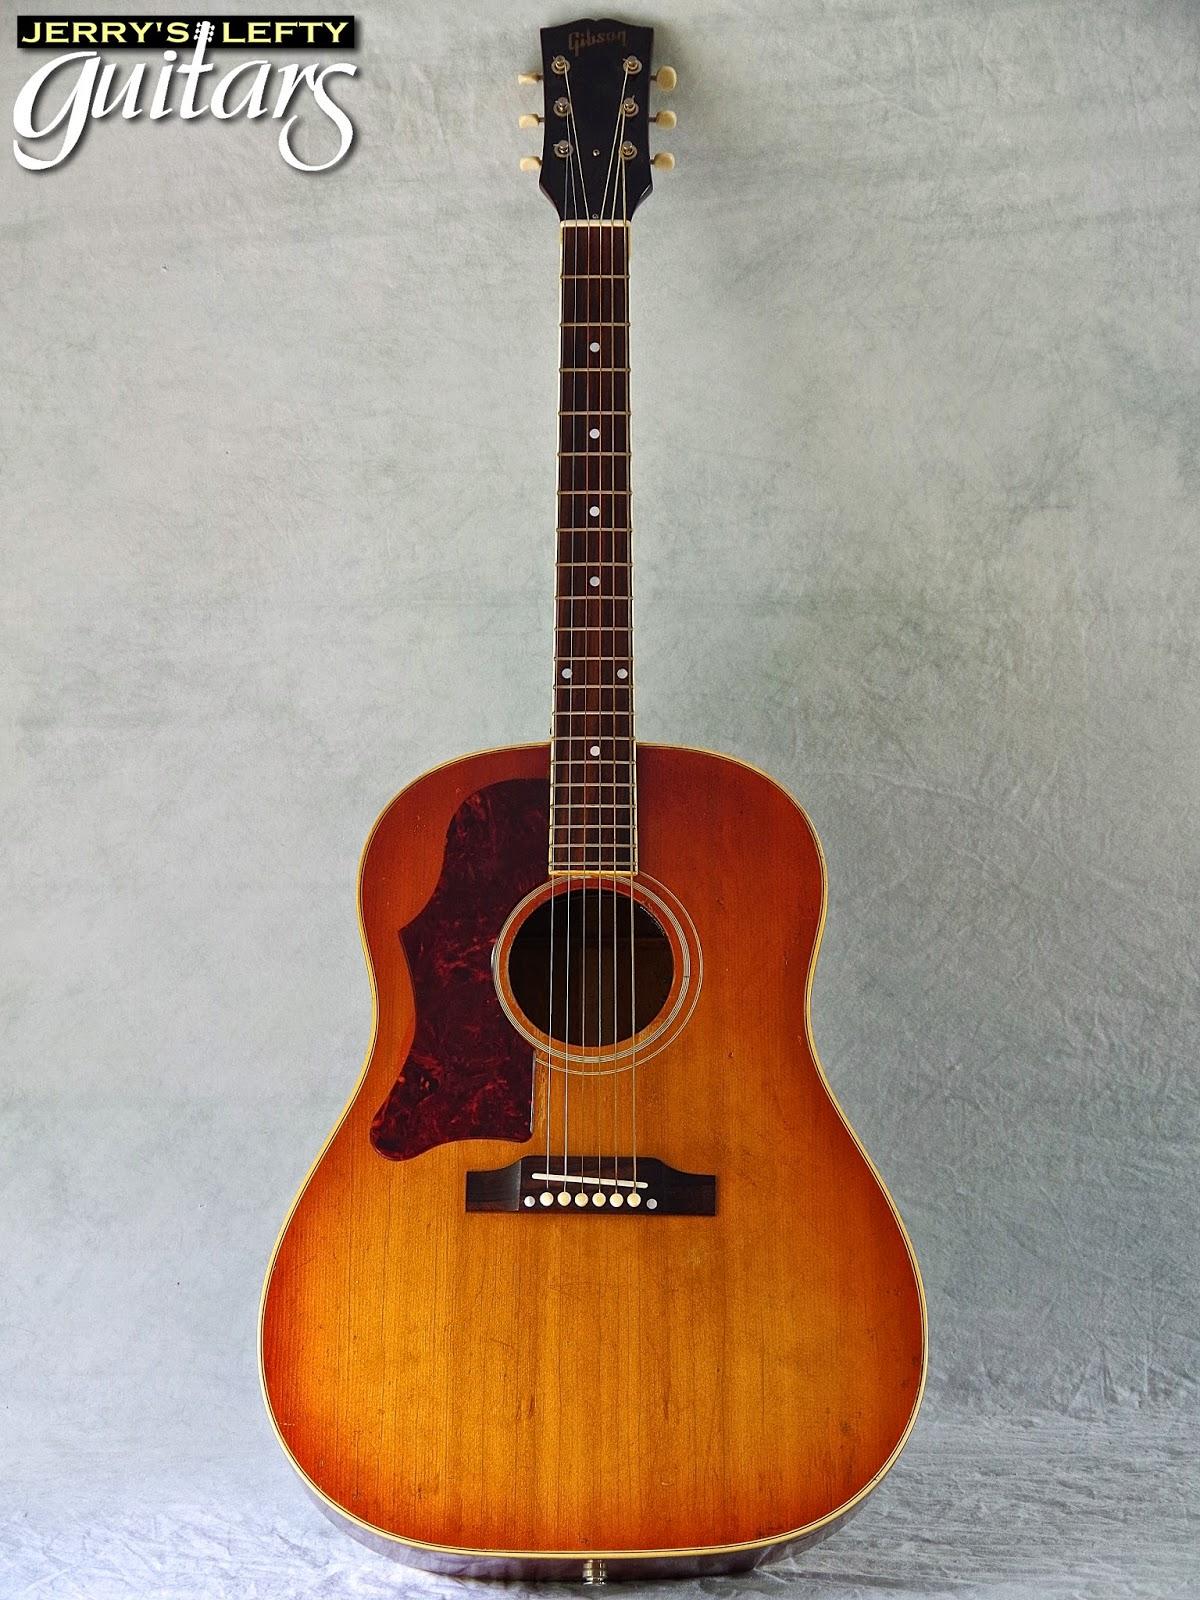 jerry 39 s lefty guitars newest guitar arrivals updated weekly 1965 gibson j45 left handed. Black Bedroom Furniture Sets. Home Design Ideas